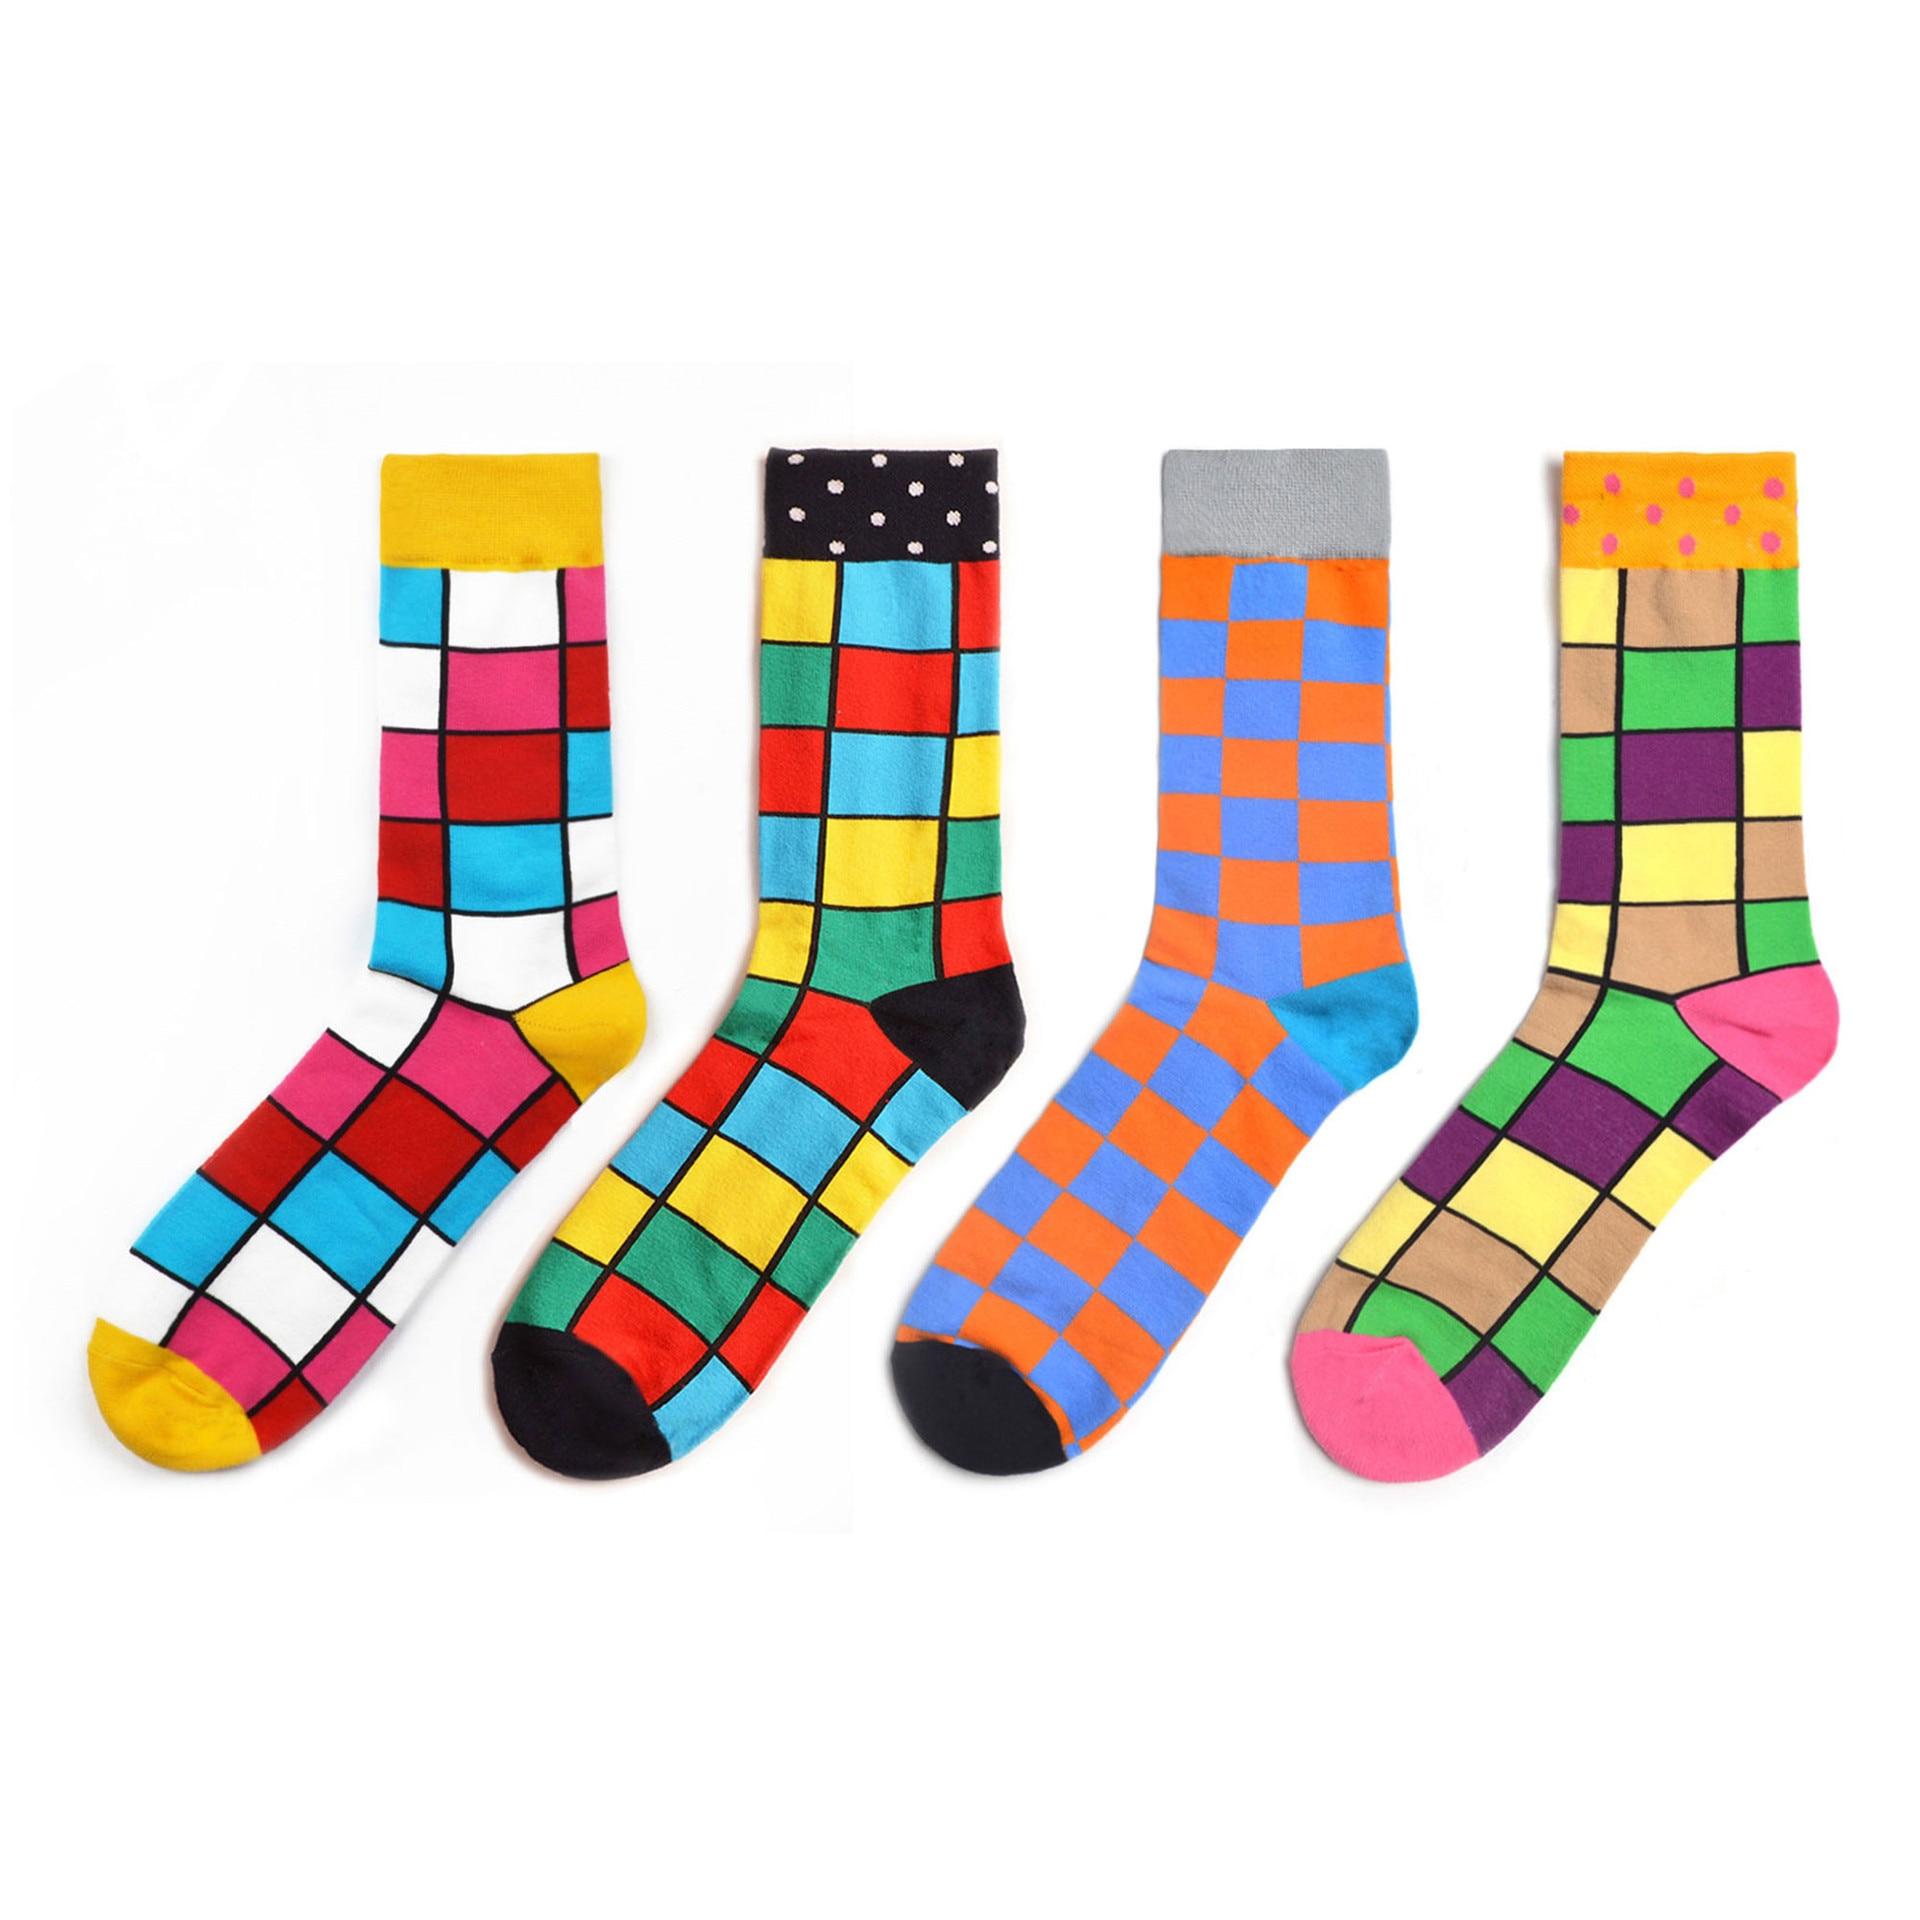 2019 New 1 Pair Brand Men Colorful Combed Cotton Happy Socks Causal Bright Street Dress Socks Funny Gift Wedding Socks SA-8